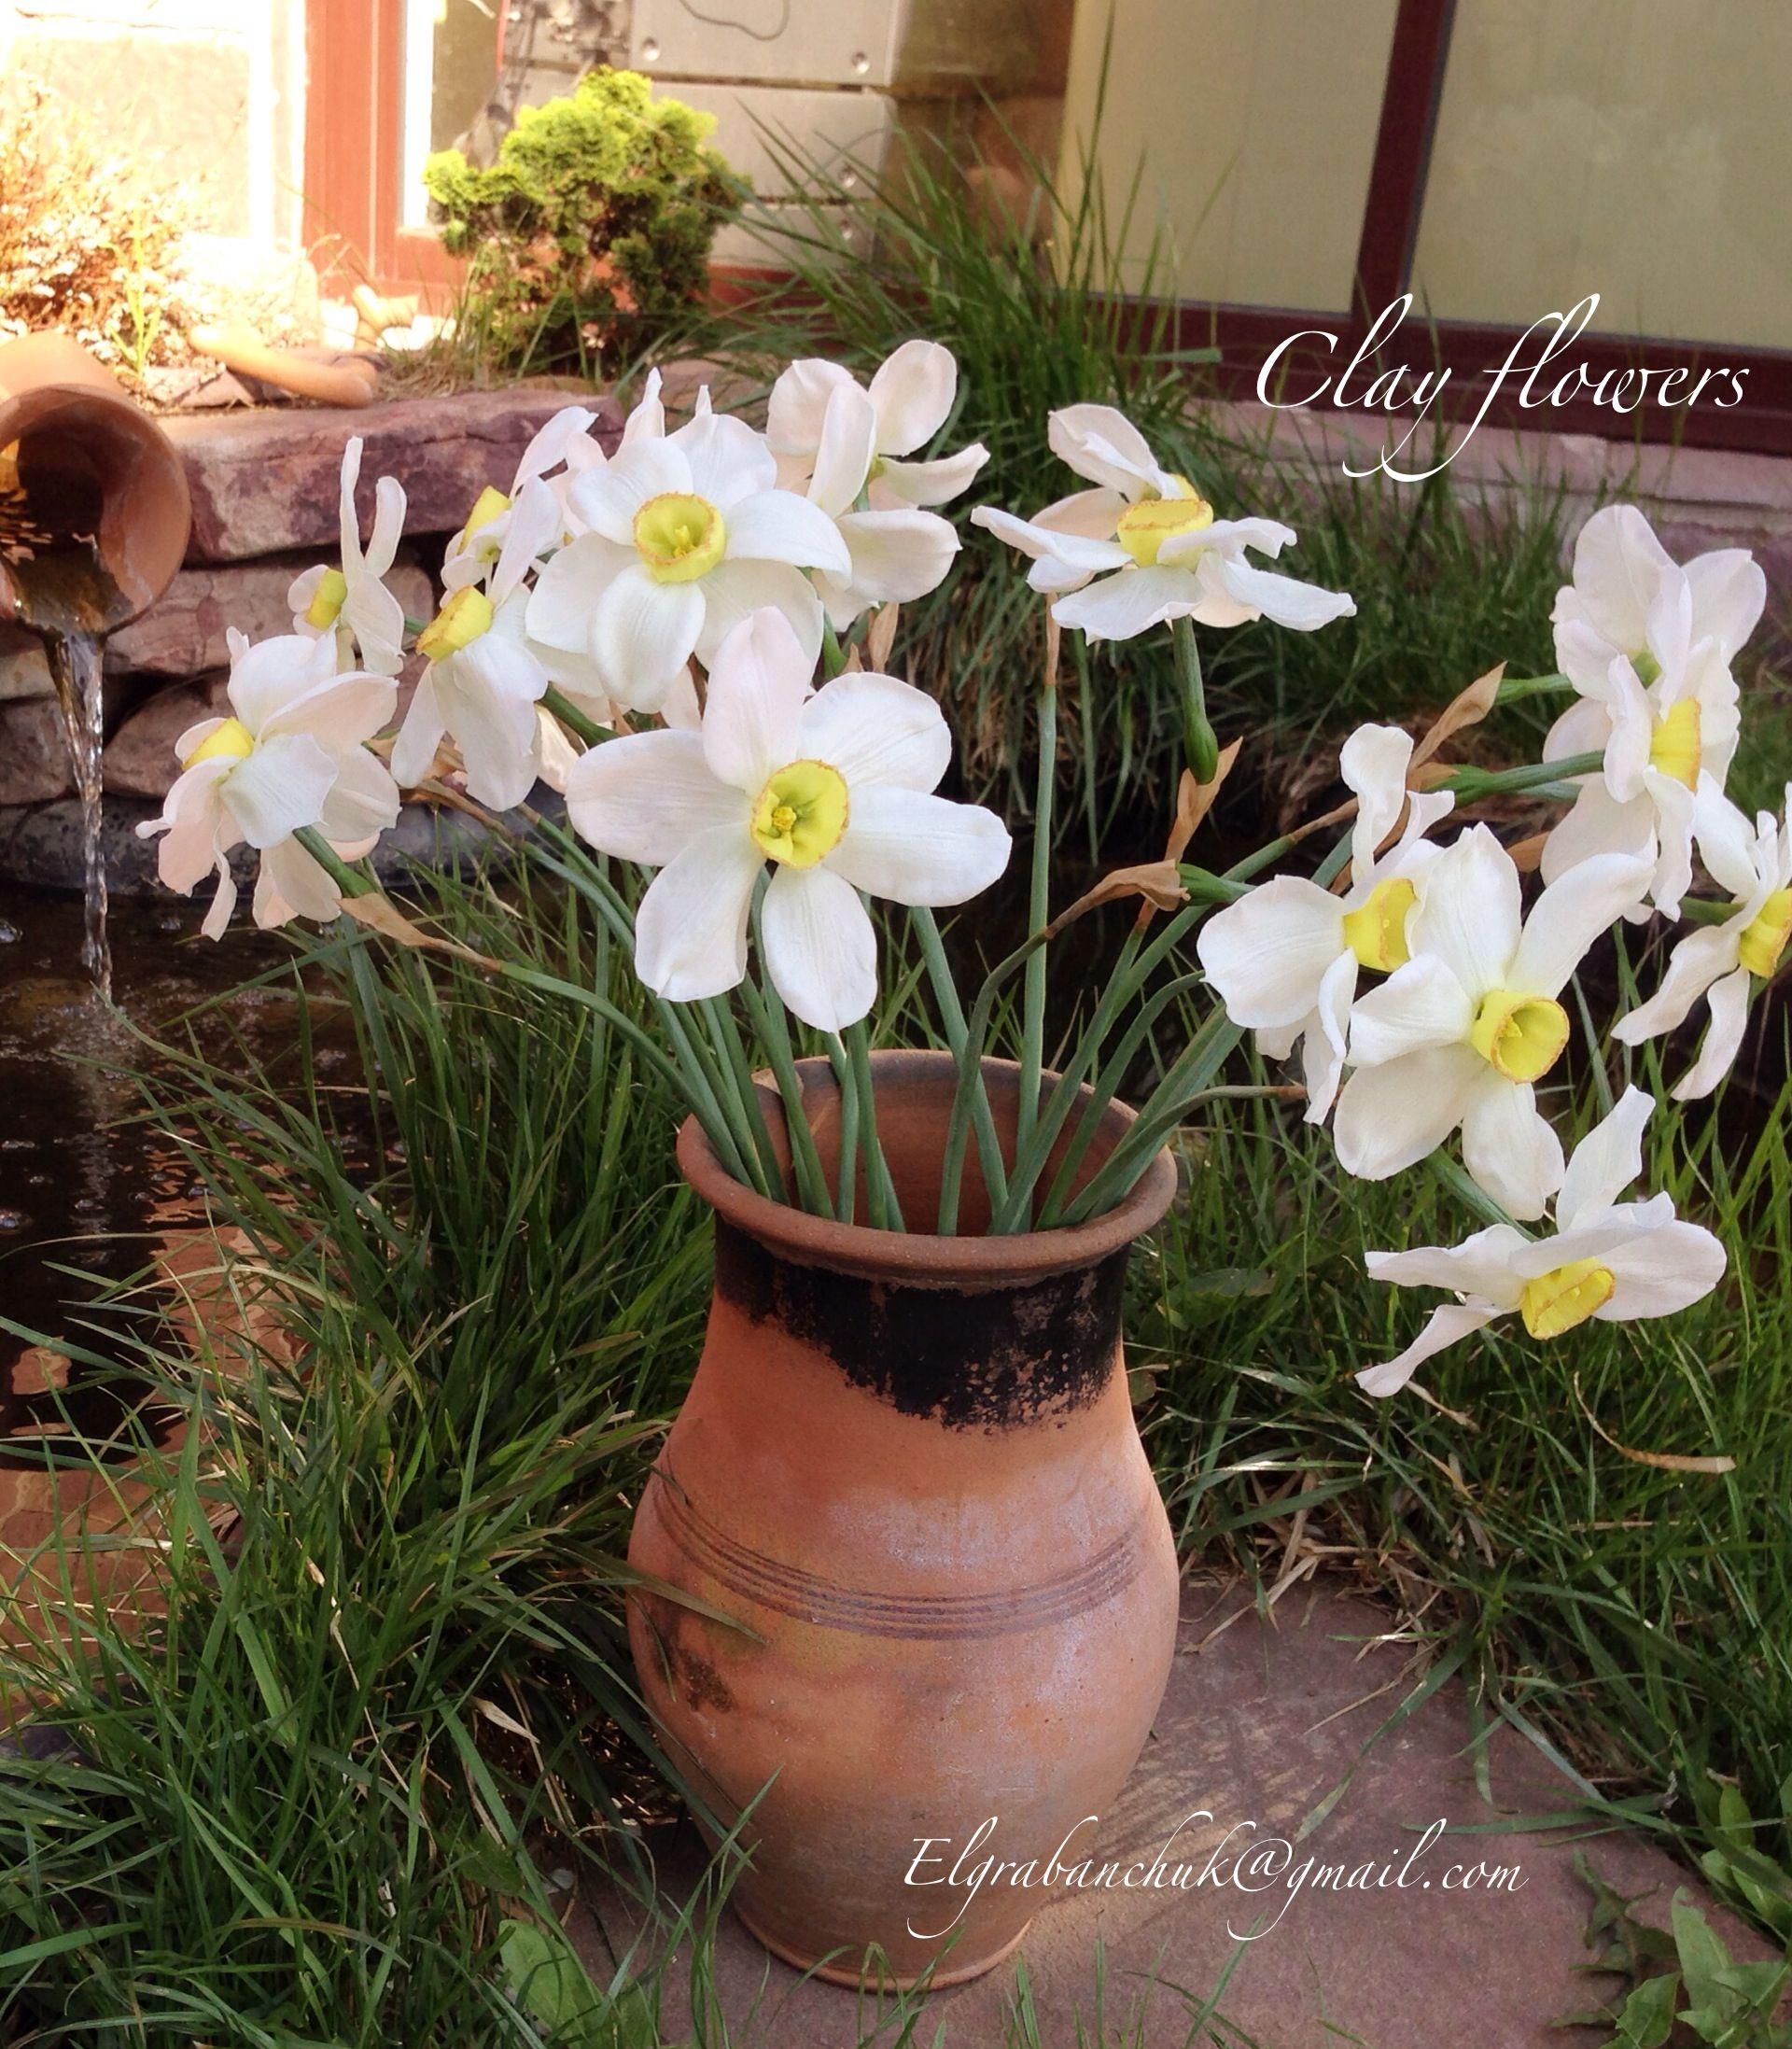 Handcrafted clay daffodils. Нарциссы из холодного фарфора.